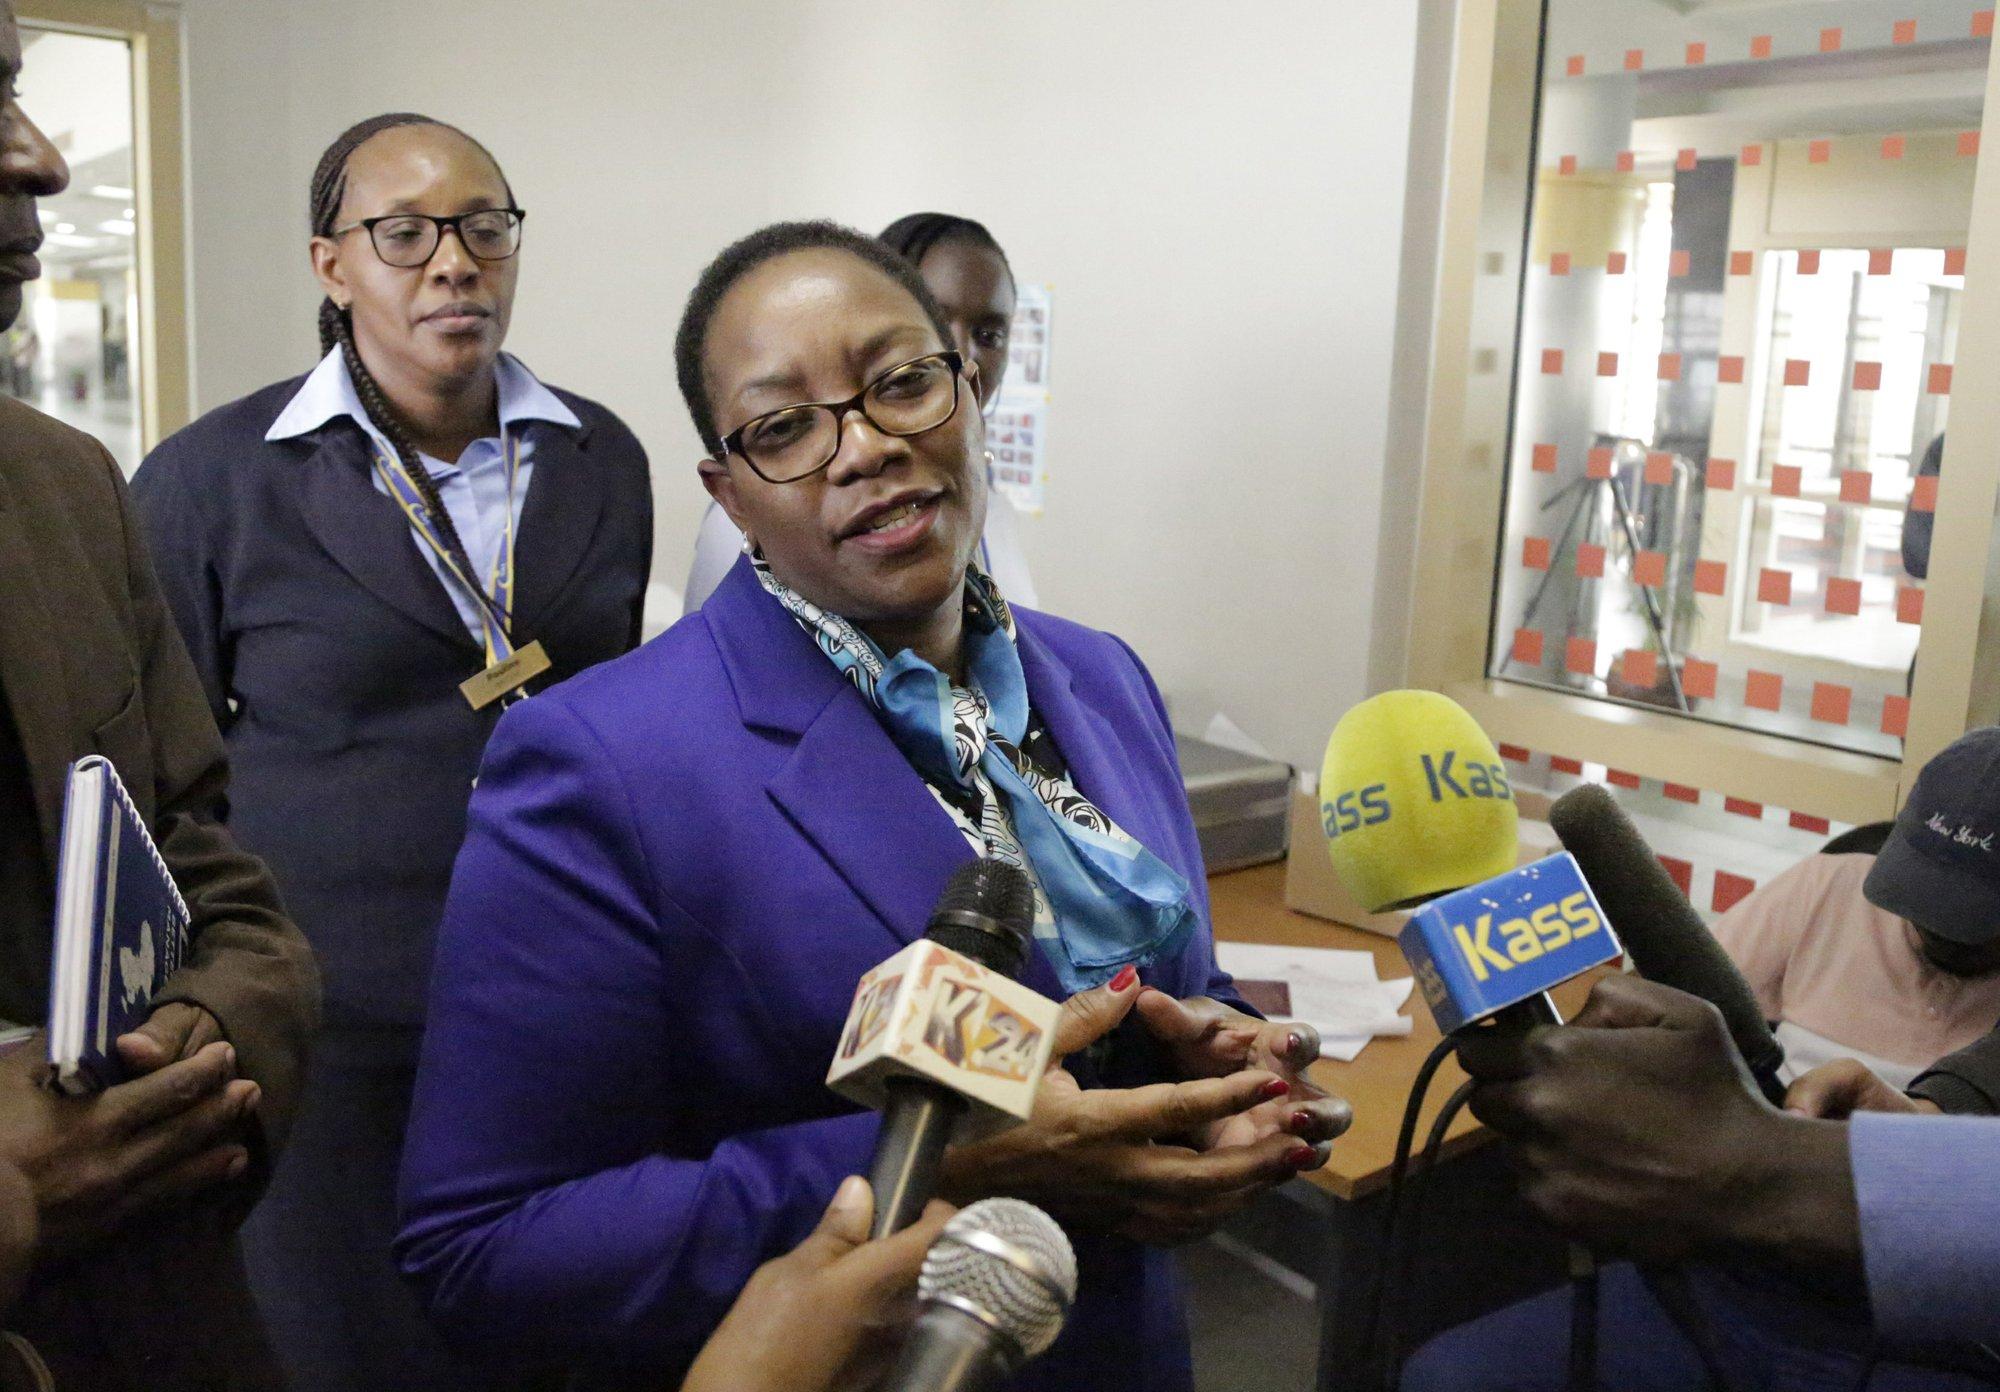 Kenya patient free of Ebola, as Congo, Uganda fight outbreak